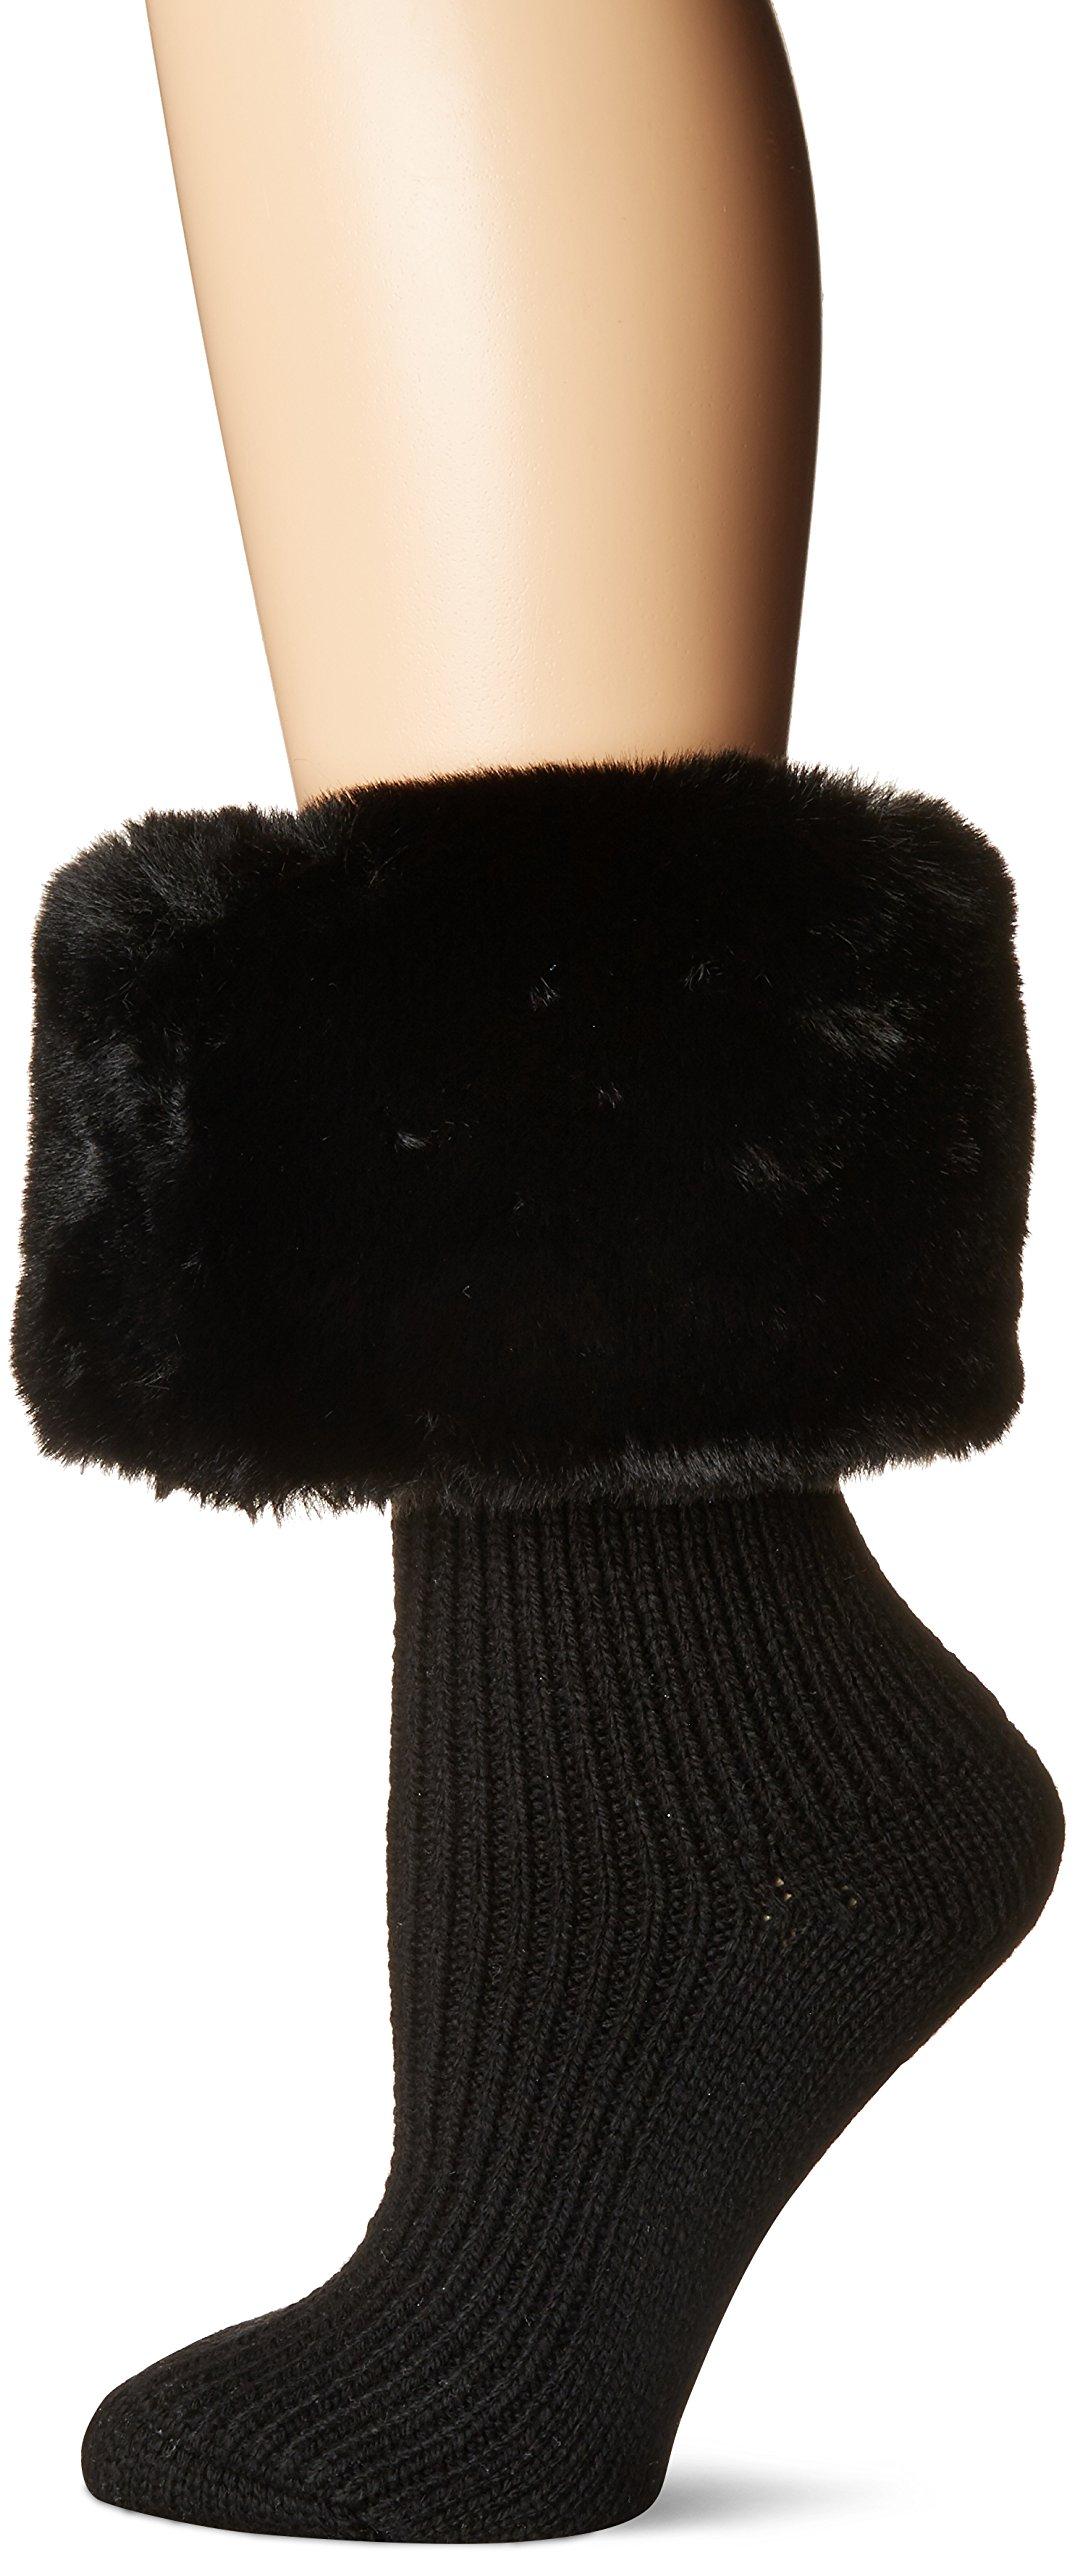 UGG Women's Faux Fur Cuff Short Rainboot Sock, black O/S